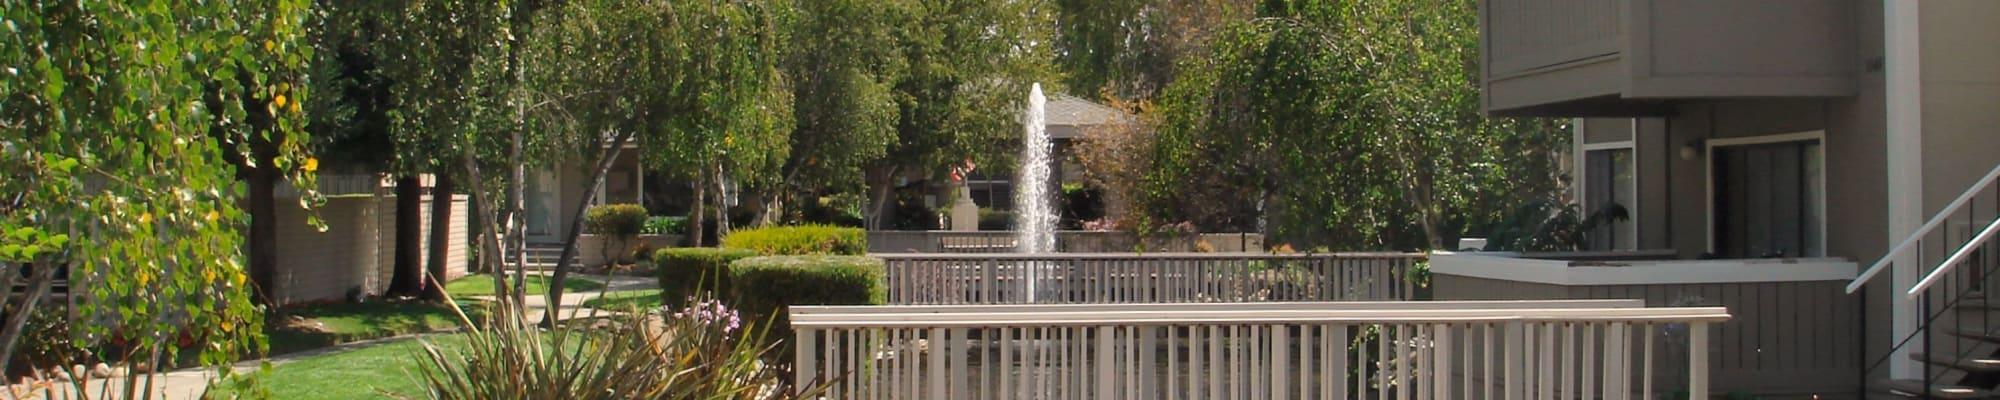 Community map at Ballena Village Apartment Homes in Alameda, California